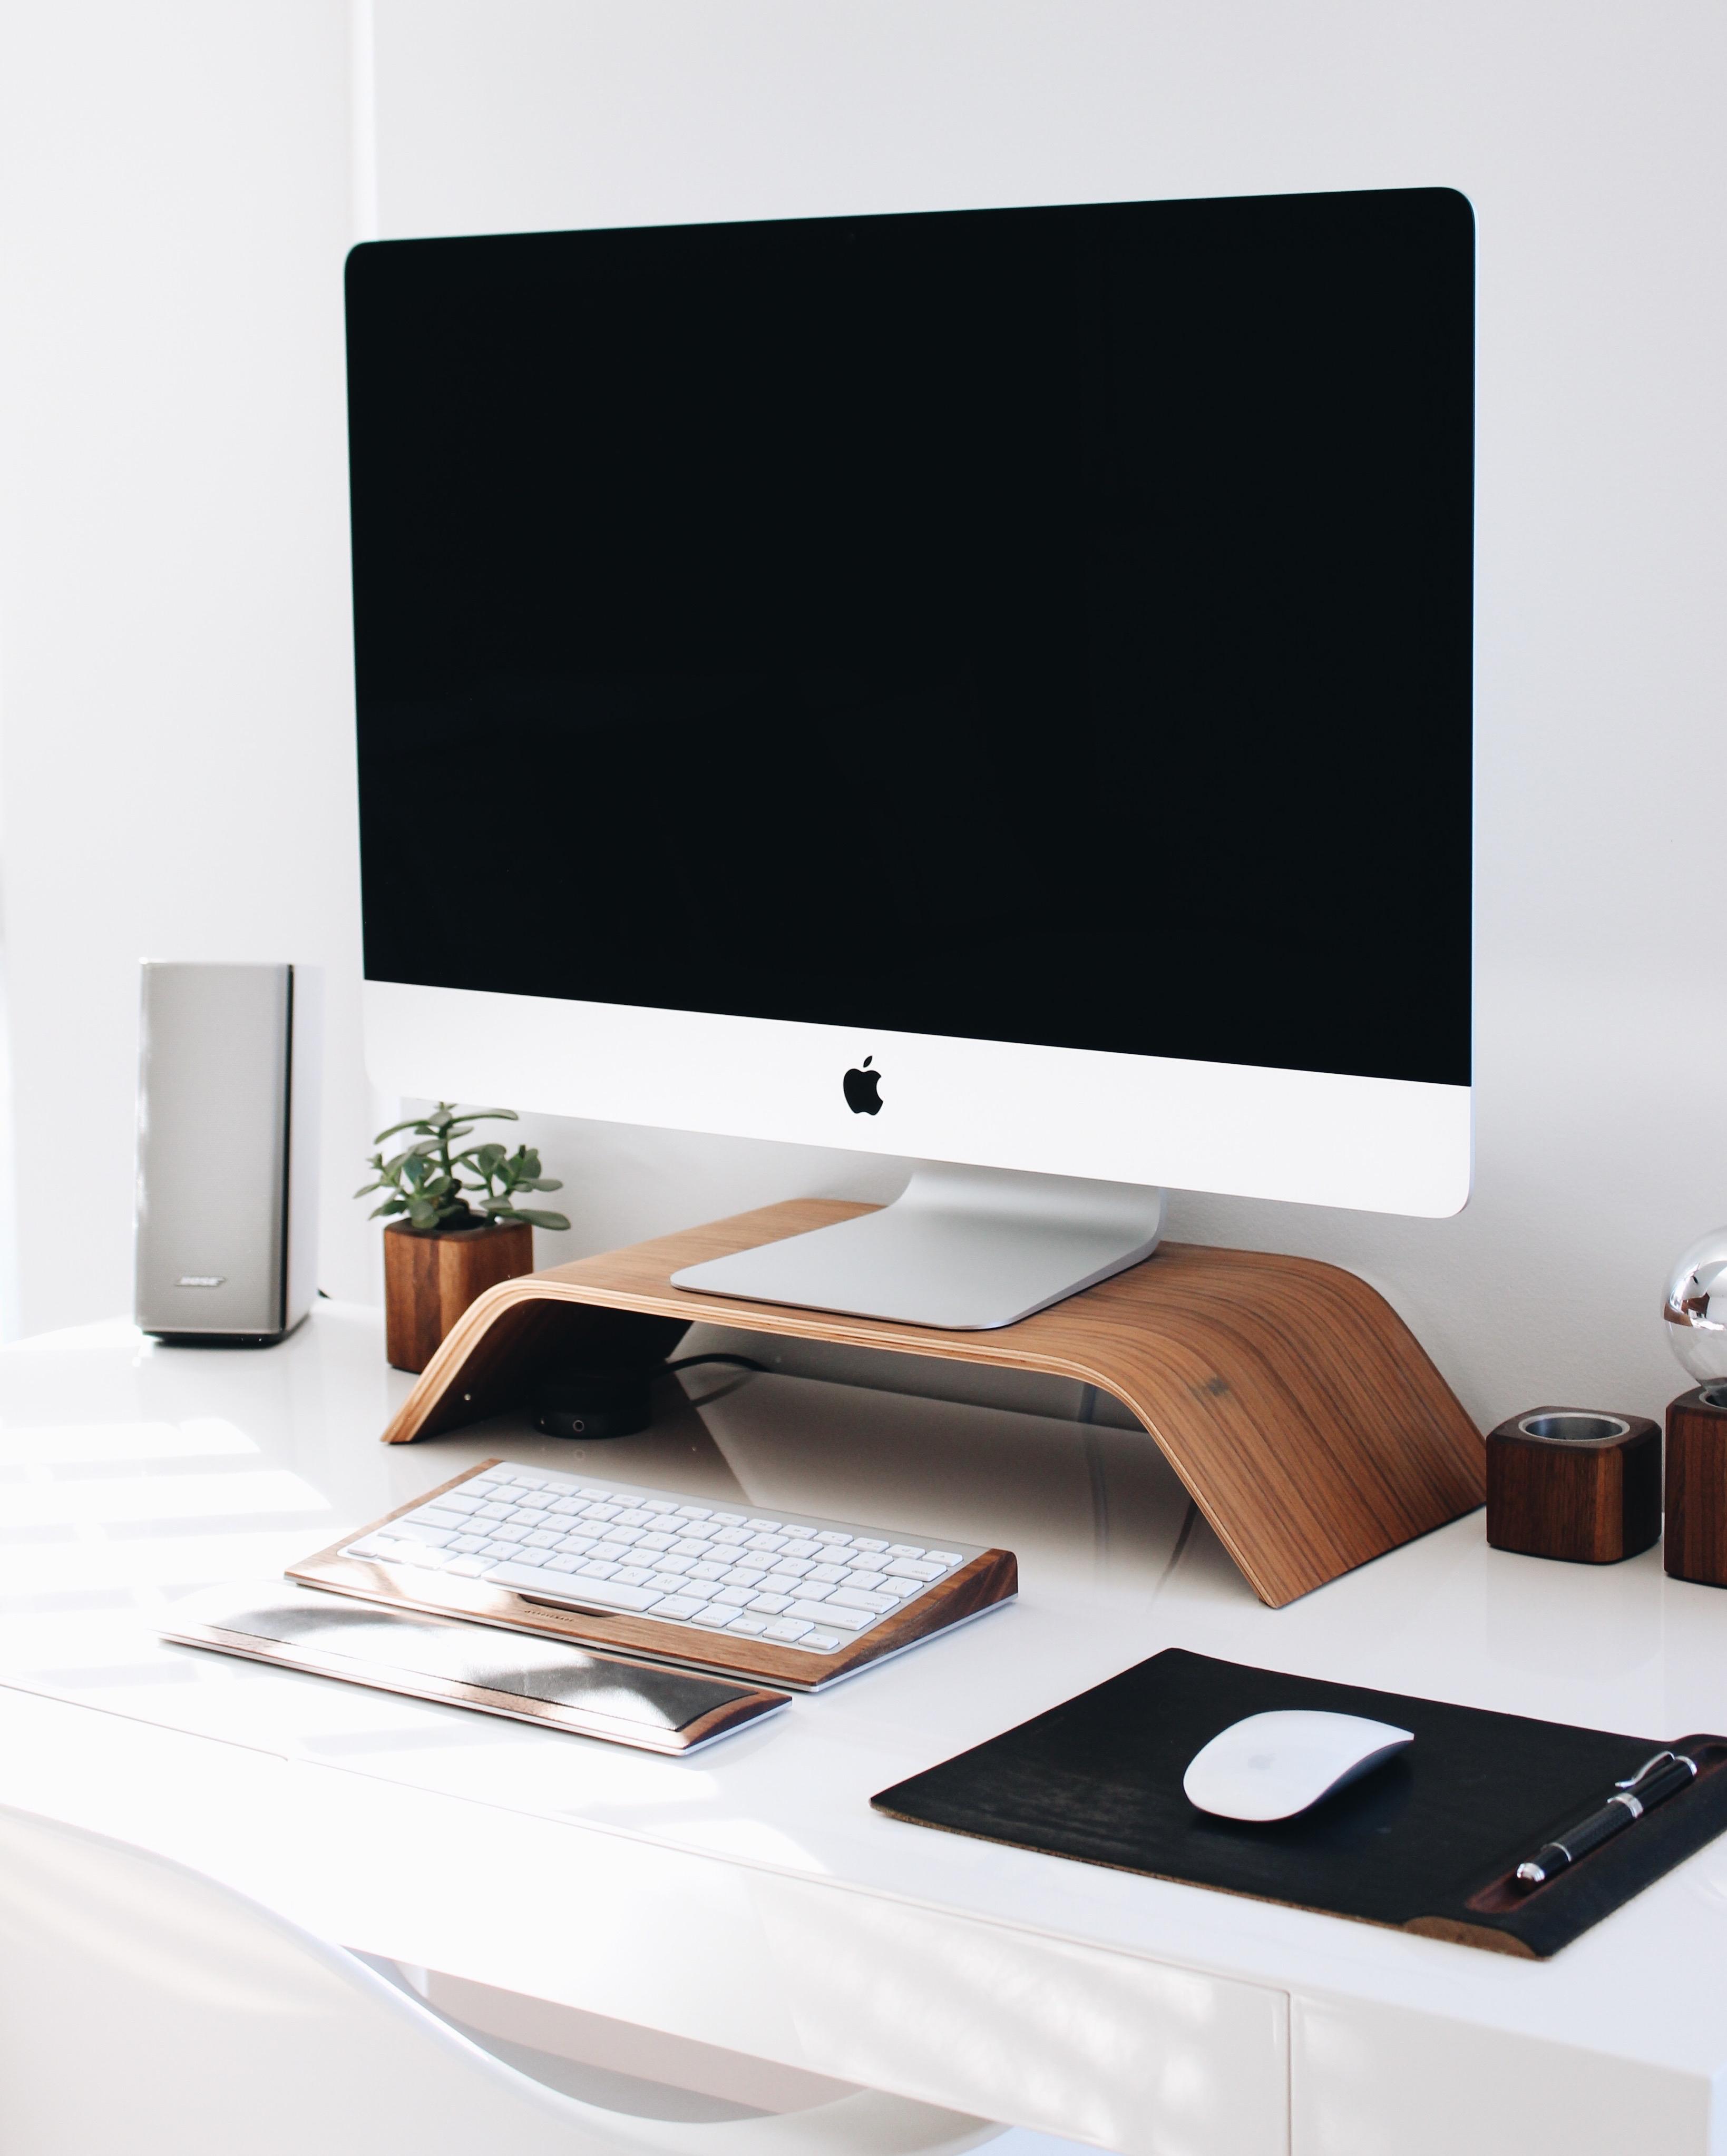 Free Images : Desk, Table, Shelf, Living Room, Television